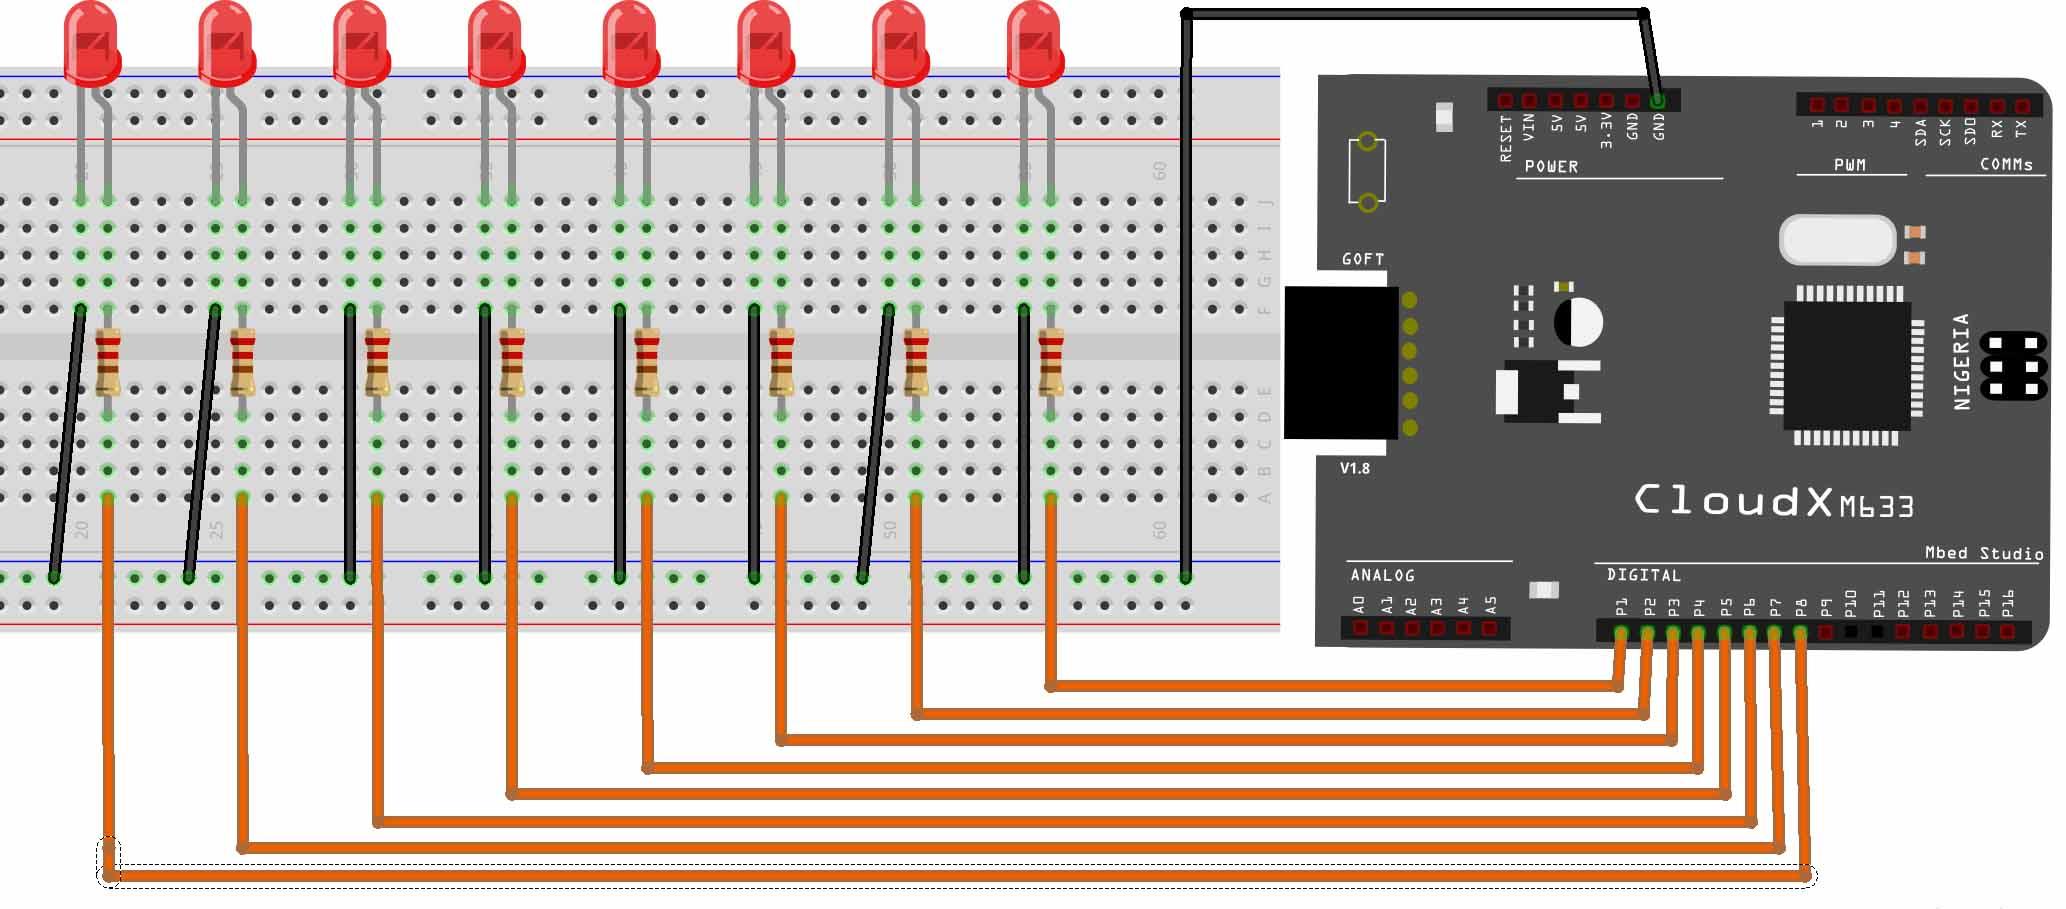 writing to ports cloudx microcontroller board tutorialArduino Blink Led 8211 Blinking An Led 8211 Tutorial 2 #20